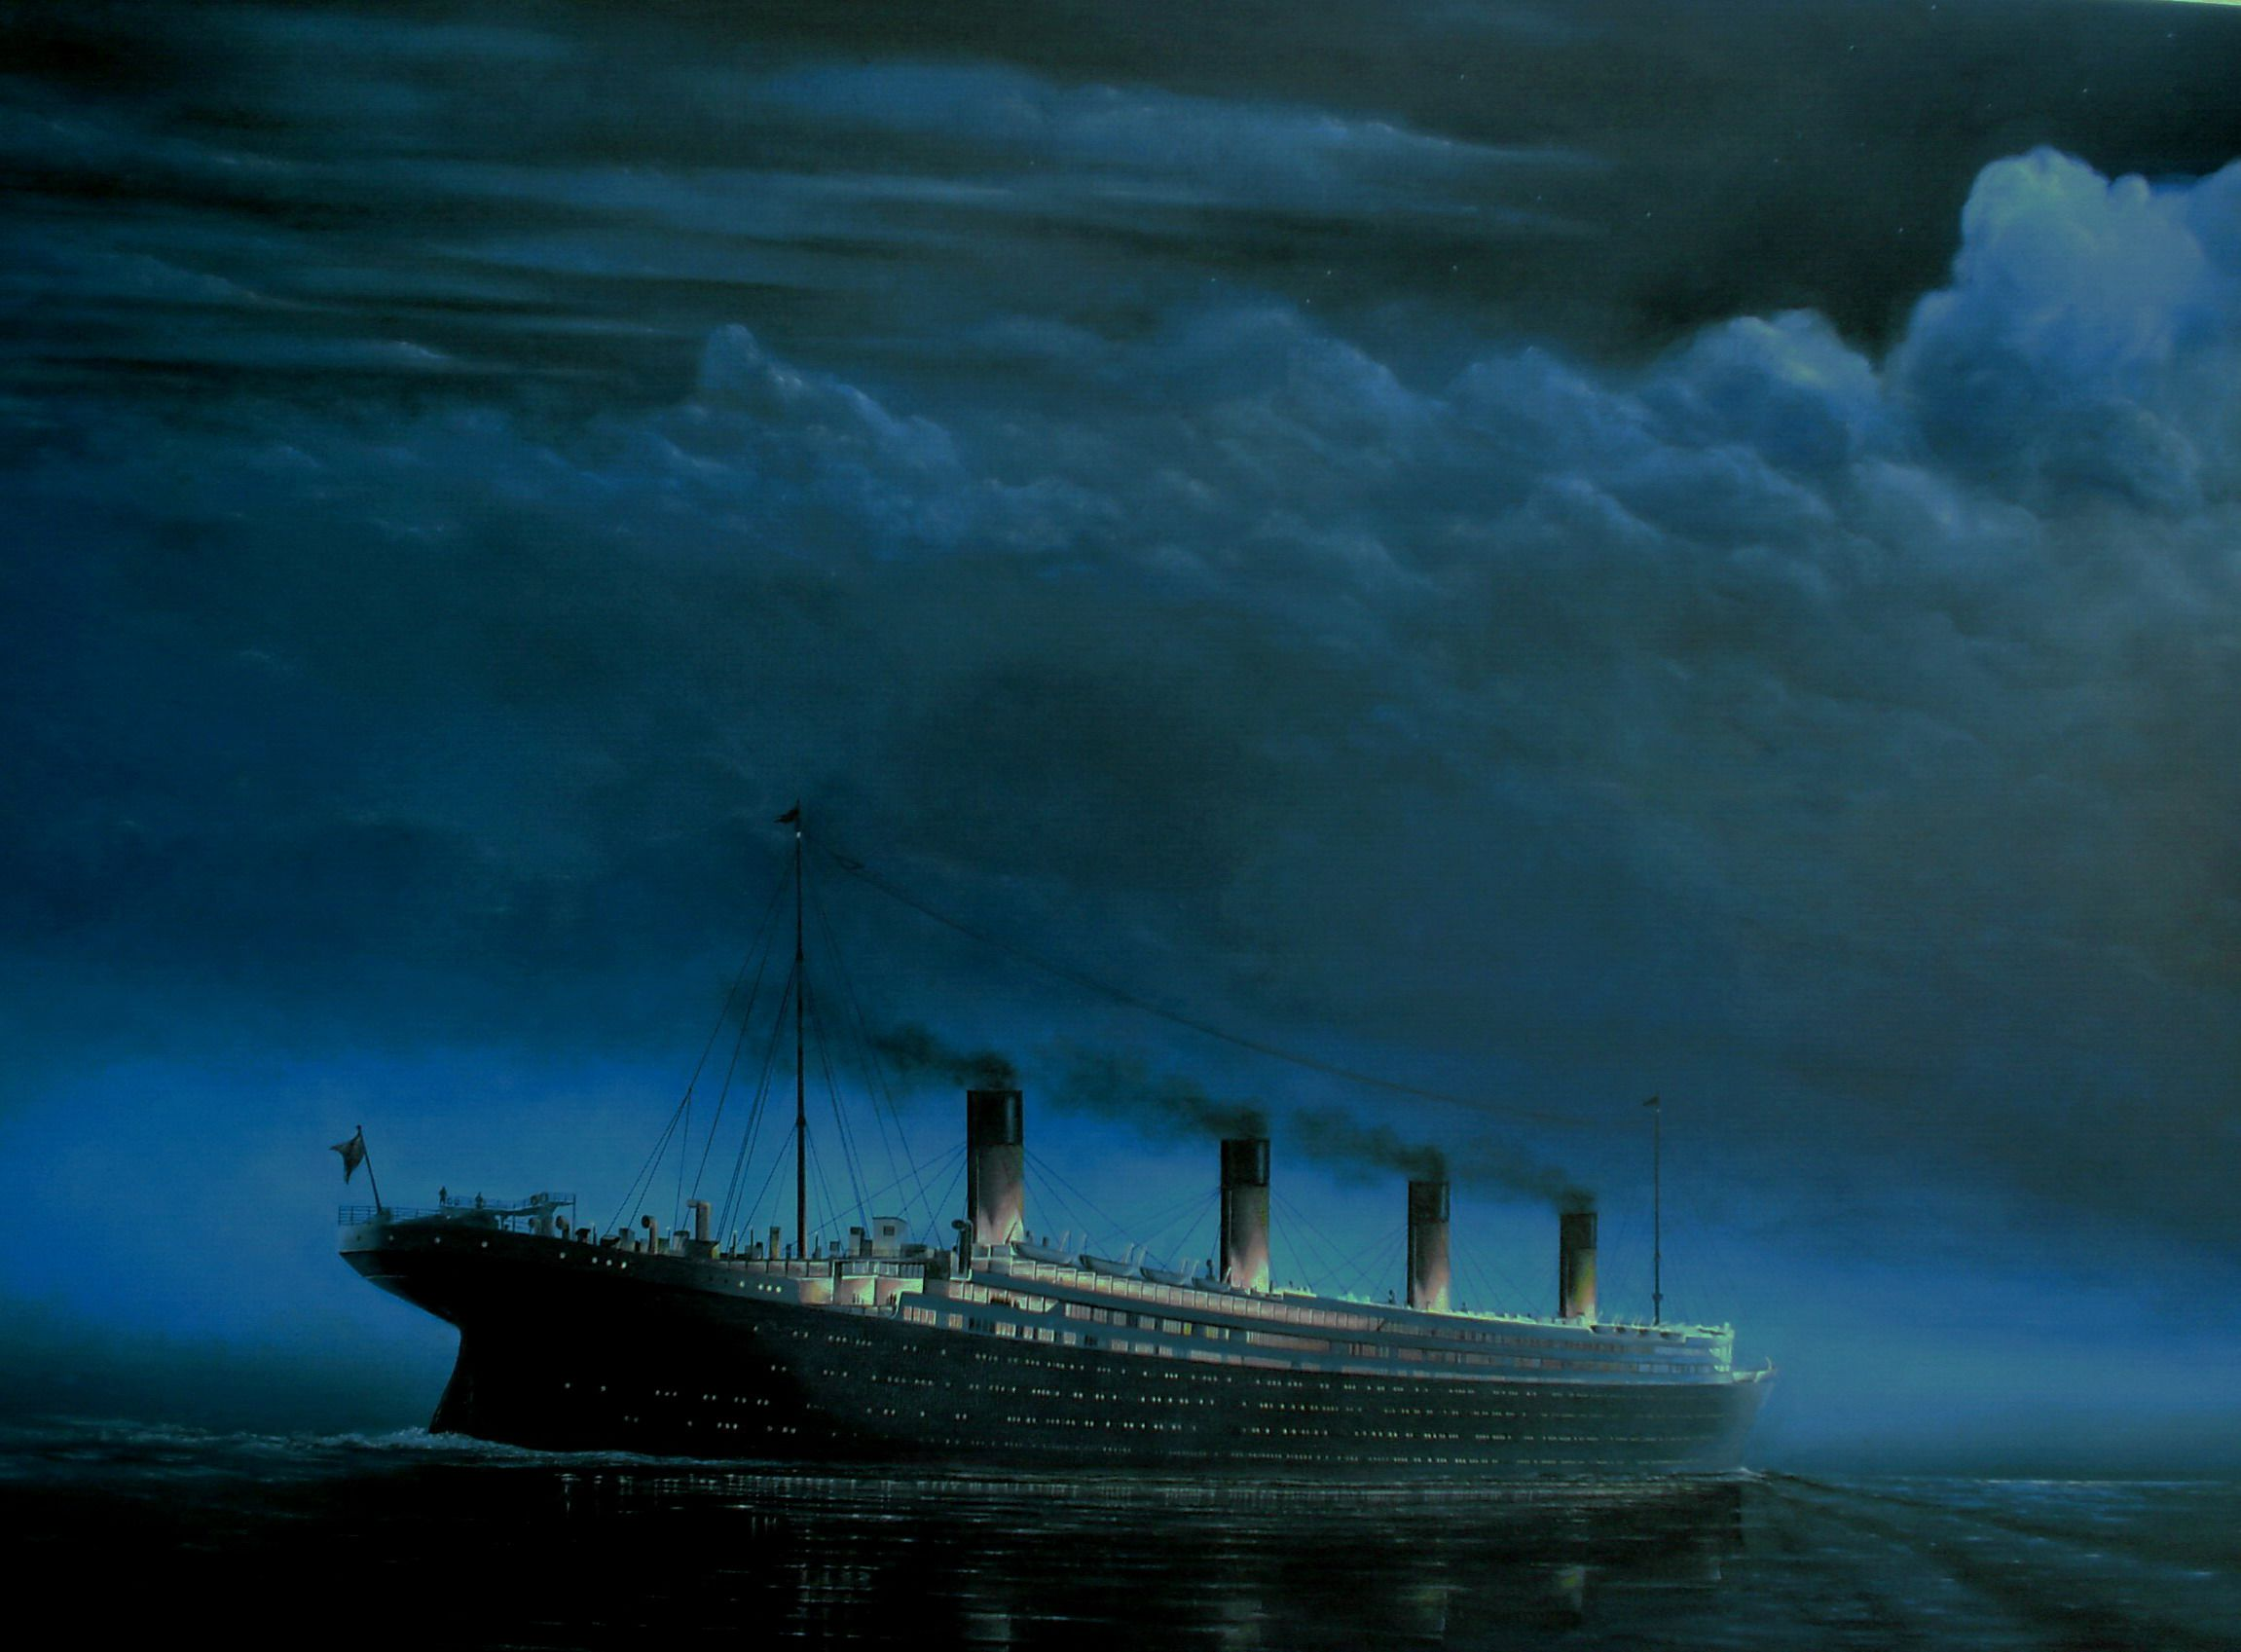 rms titanic   RMS Titanic artwork   real artwork   Pinterest   RMS ...